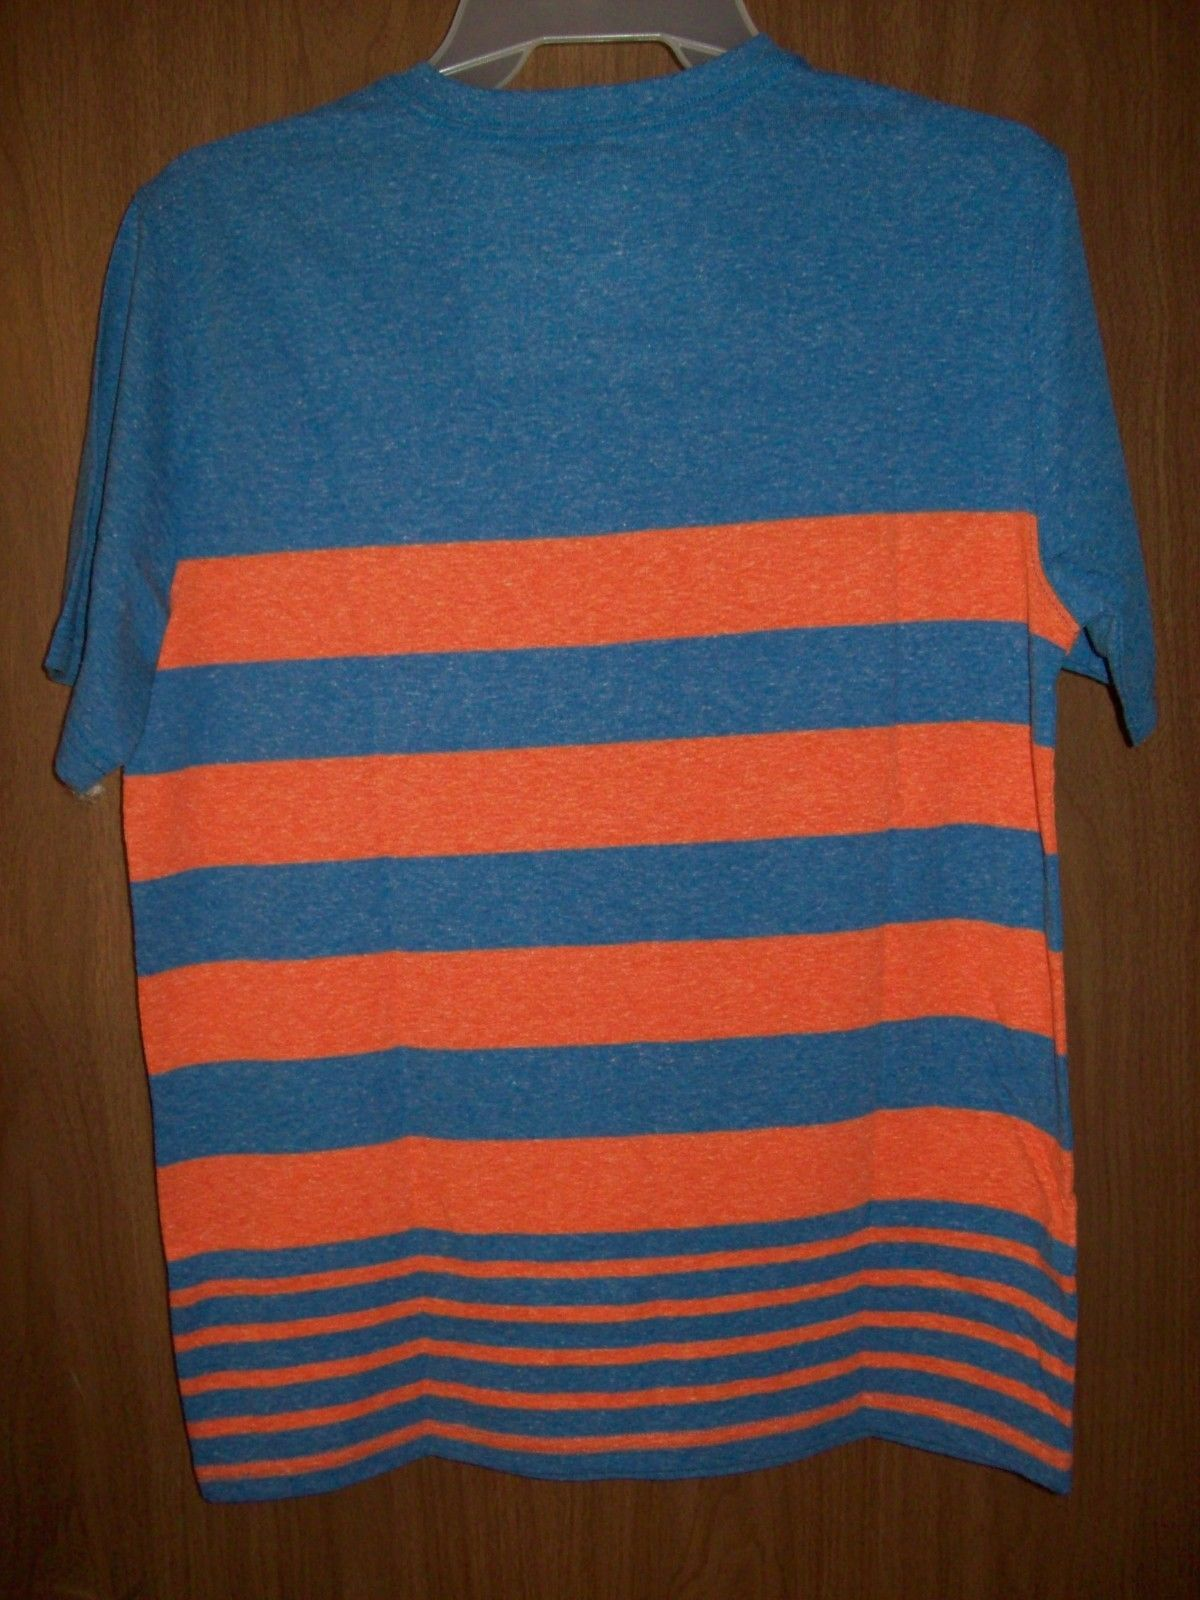 New Boys Wonder Nation Stripe Gray Red Pocket V-Neck Shirt Tee Size Large 10-12